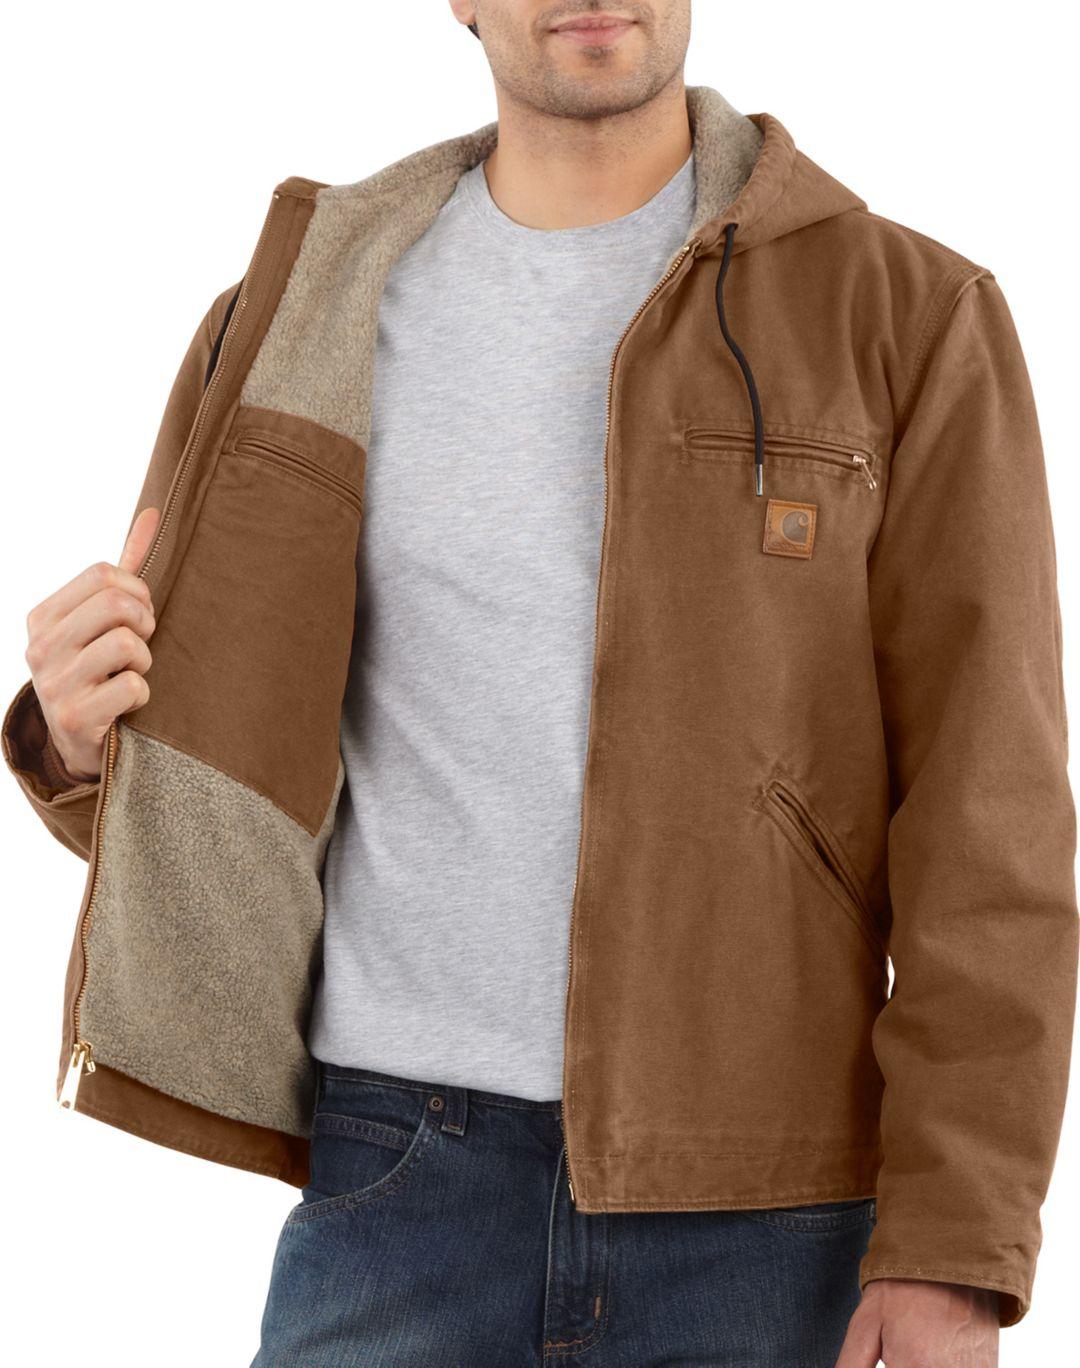 21442b66237 Carhartt Men's Sandstone Sierra Jacket